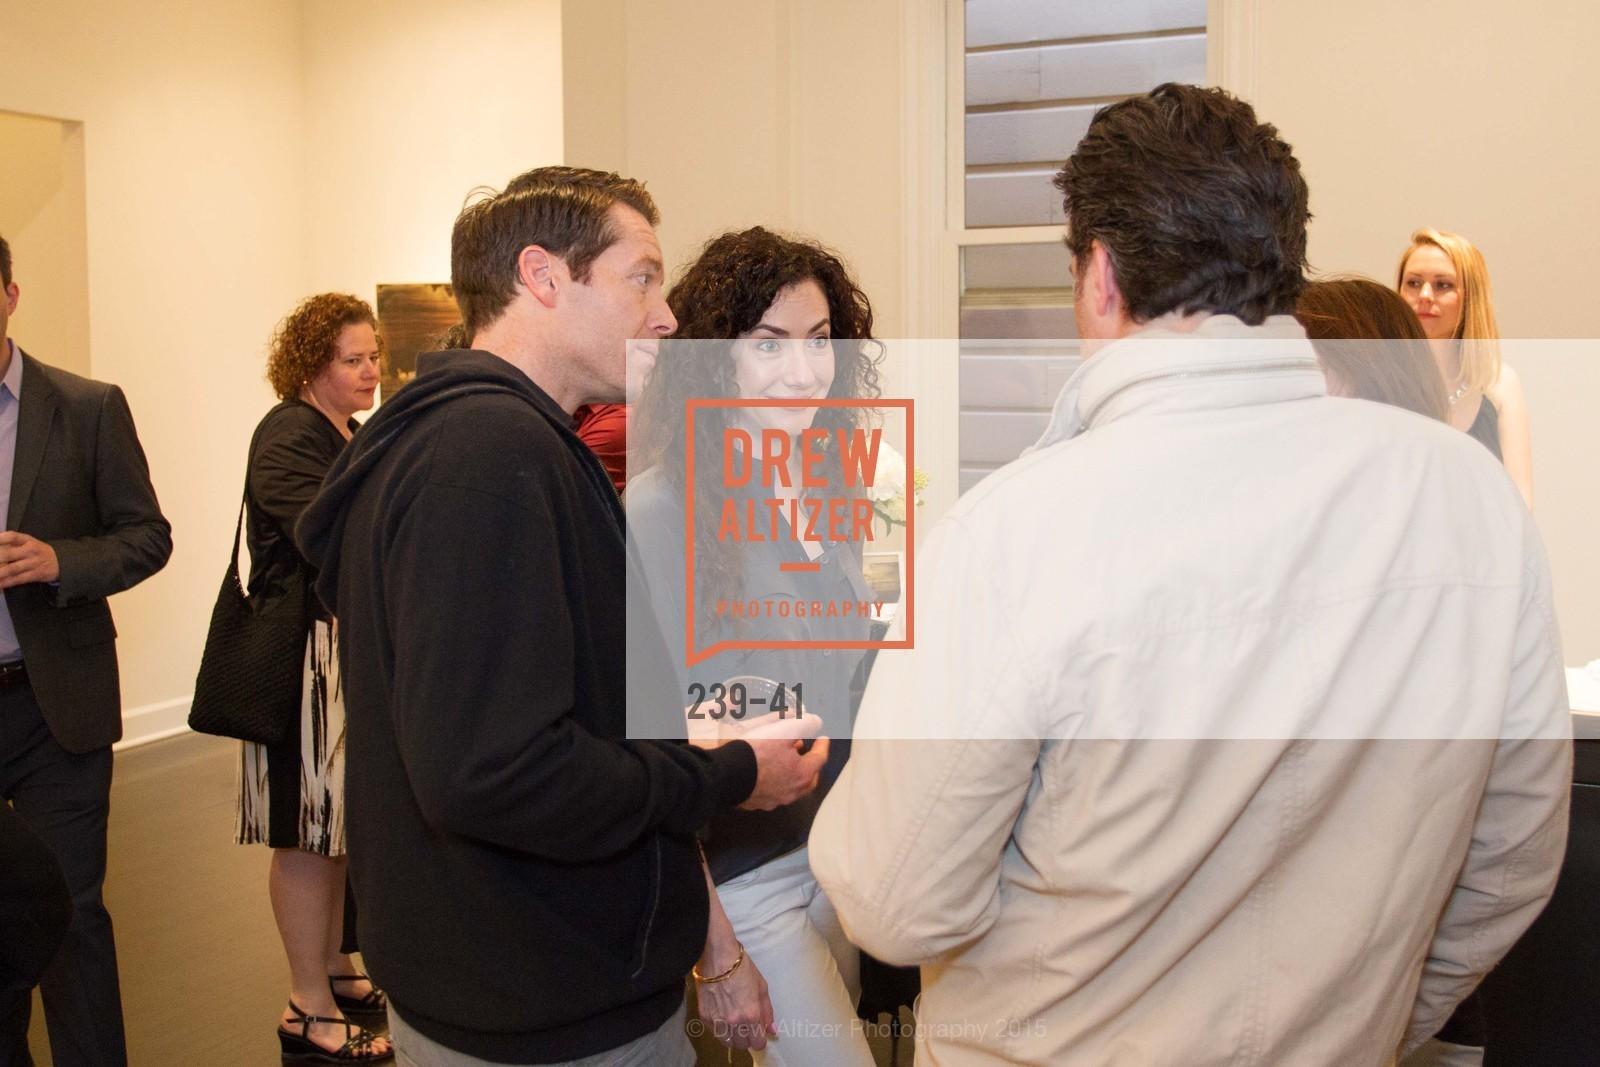 Jake Shemano, Jenny Bailey, Projex Connect presents